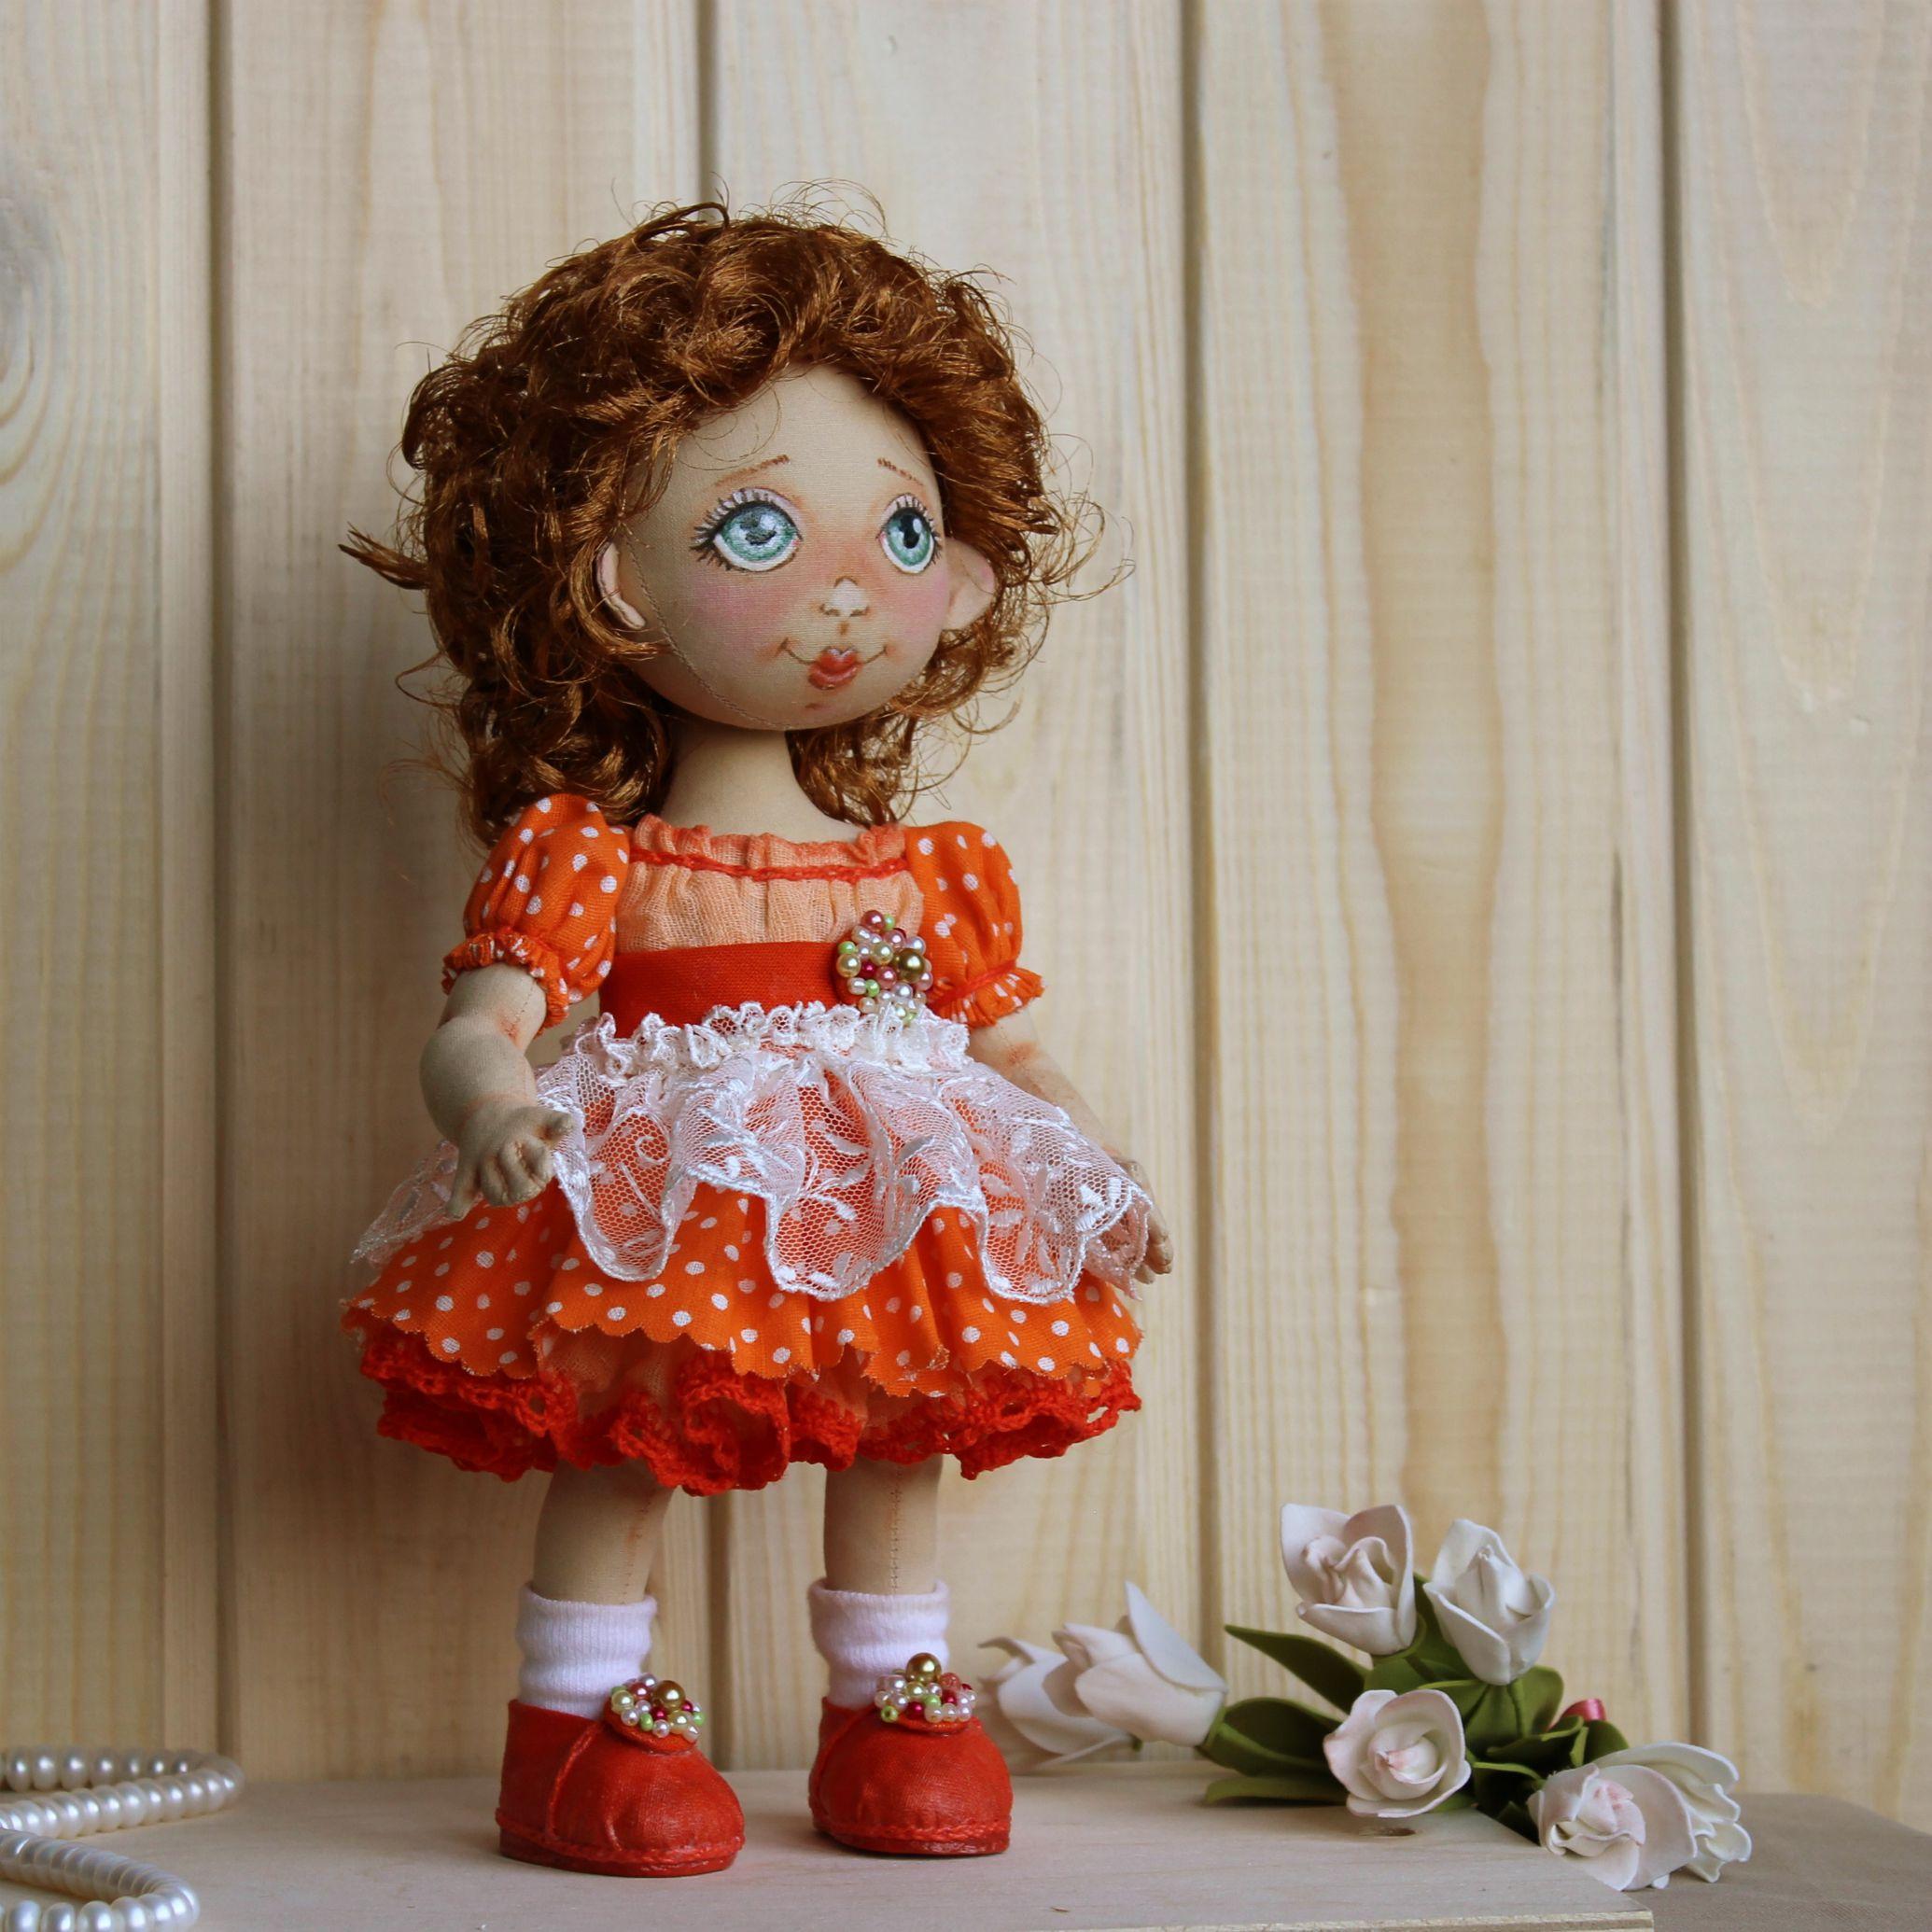 подарок красивая работа ручная кукла куклы